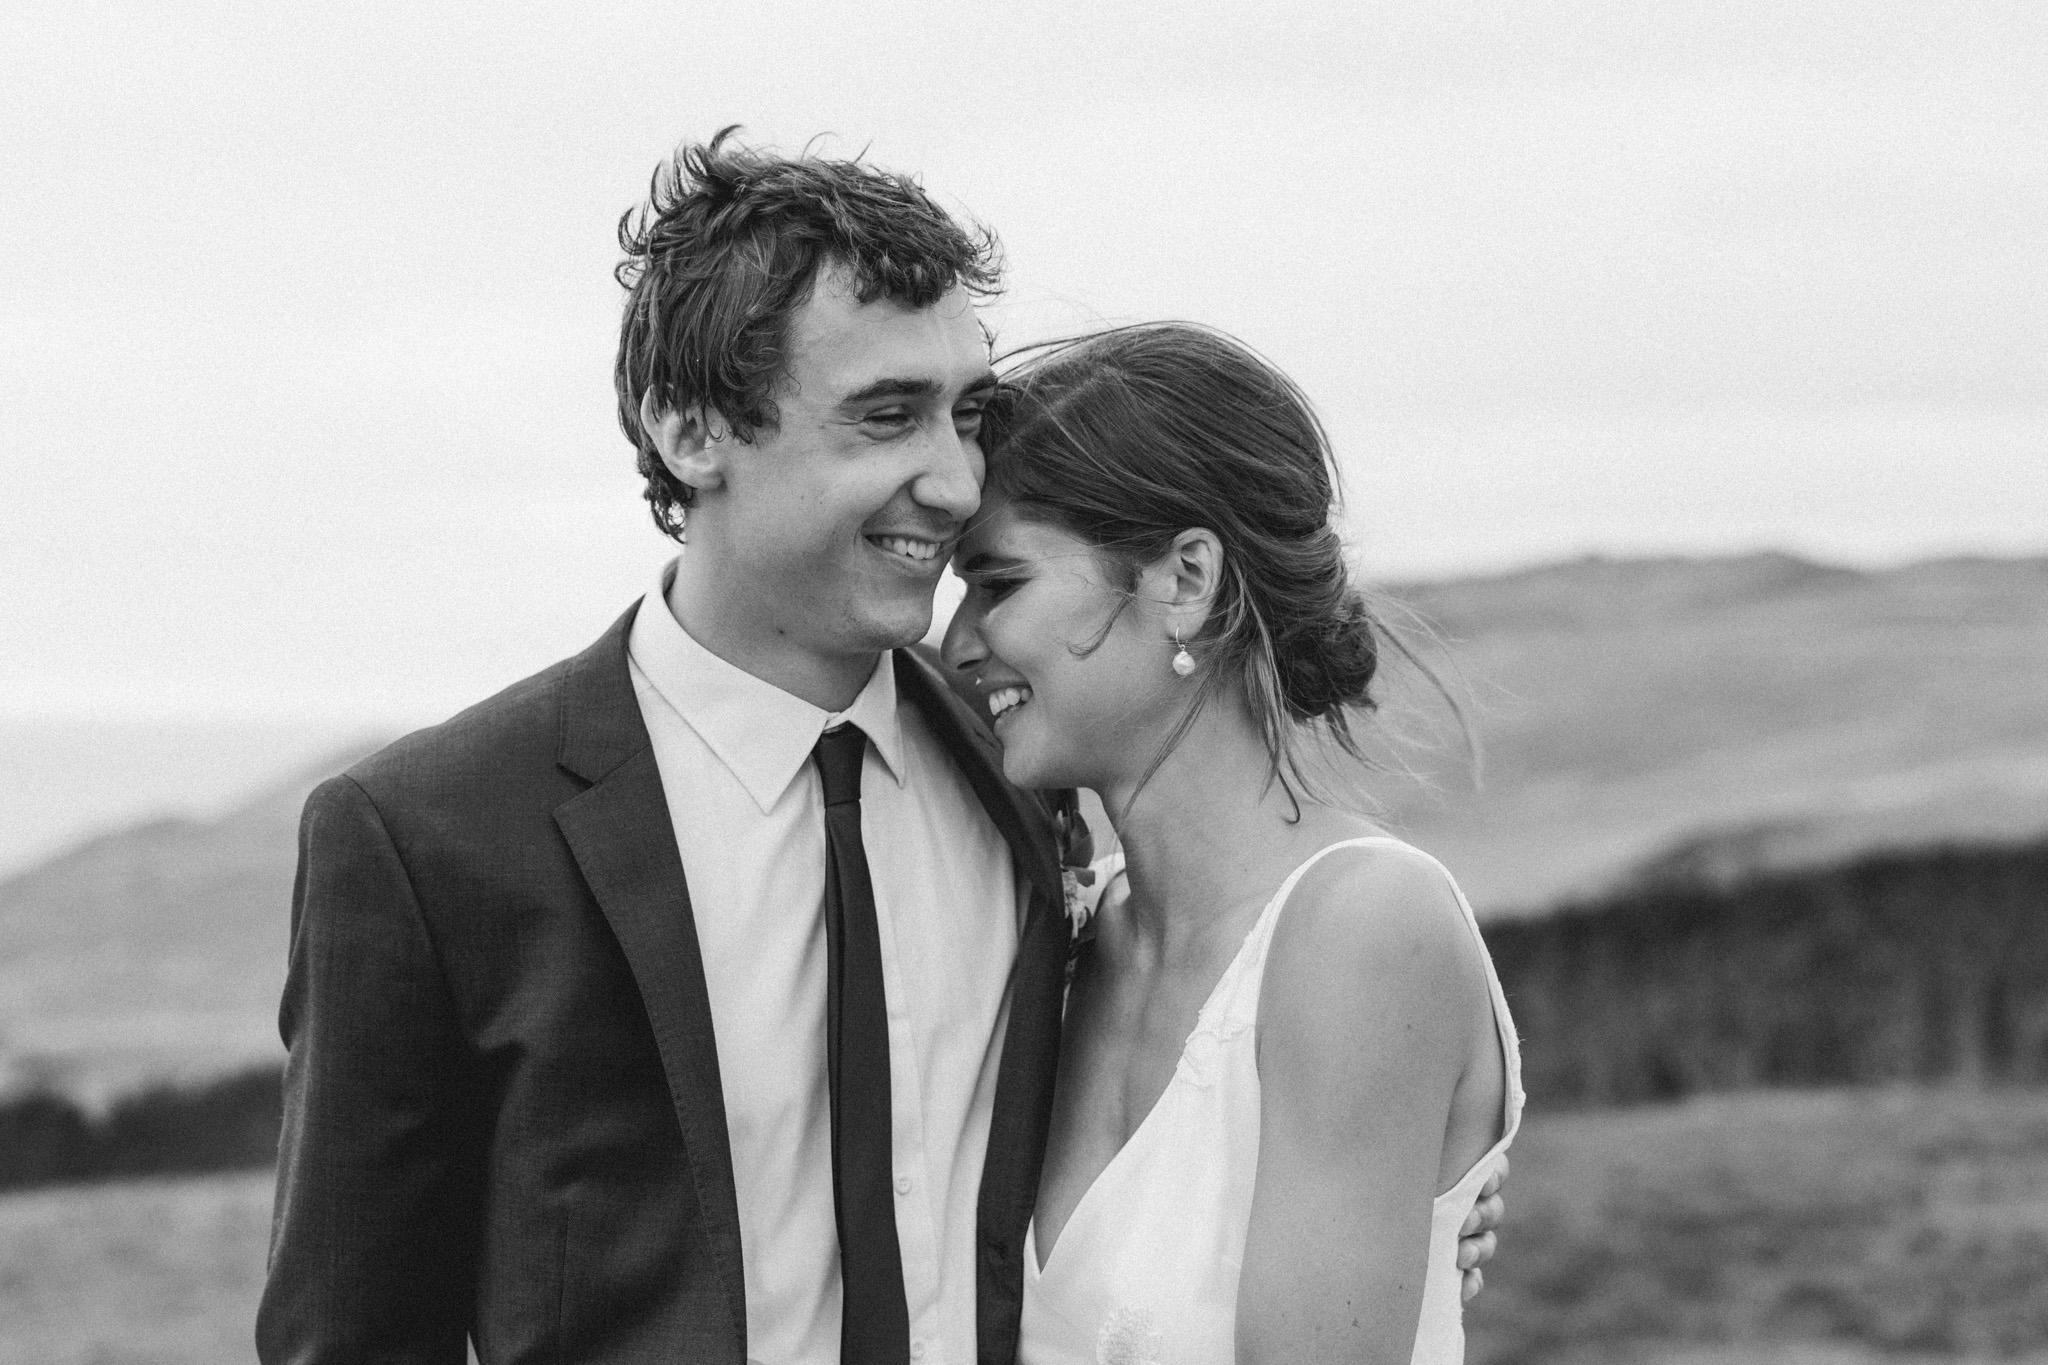 newfound-h-m-castaways-waiuku-auckland-wedding-photographer-181